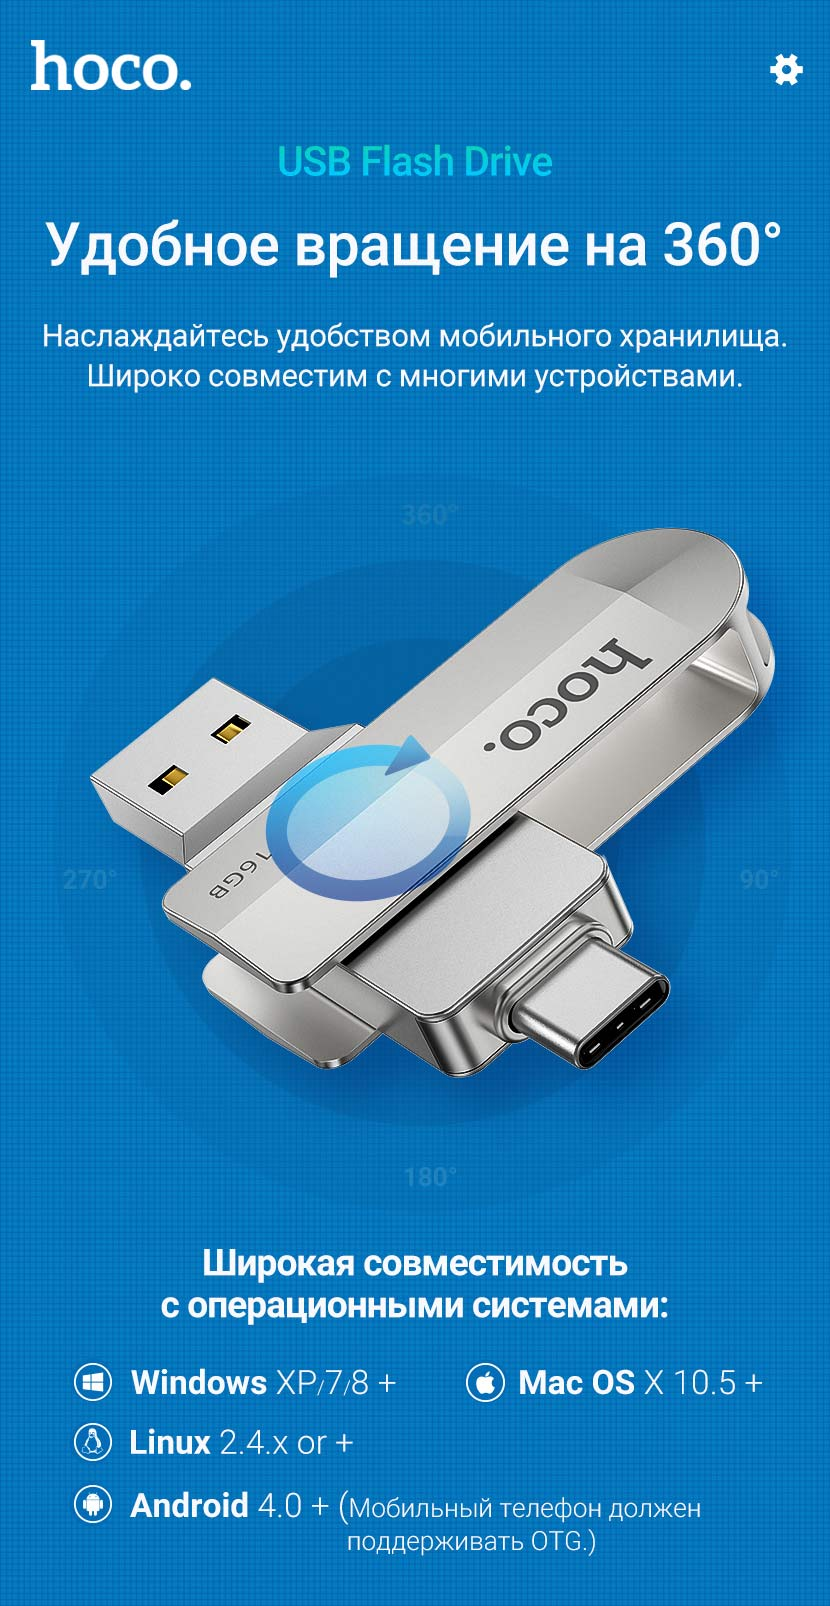 hoco news ud10 wise type c usb flash drive rotation ru